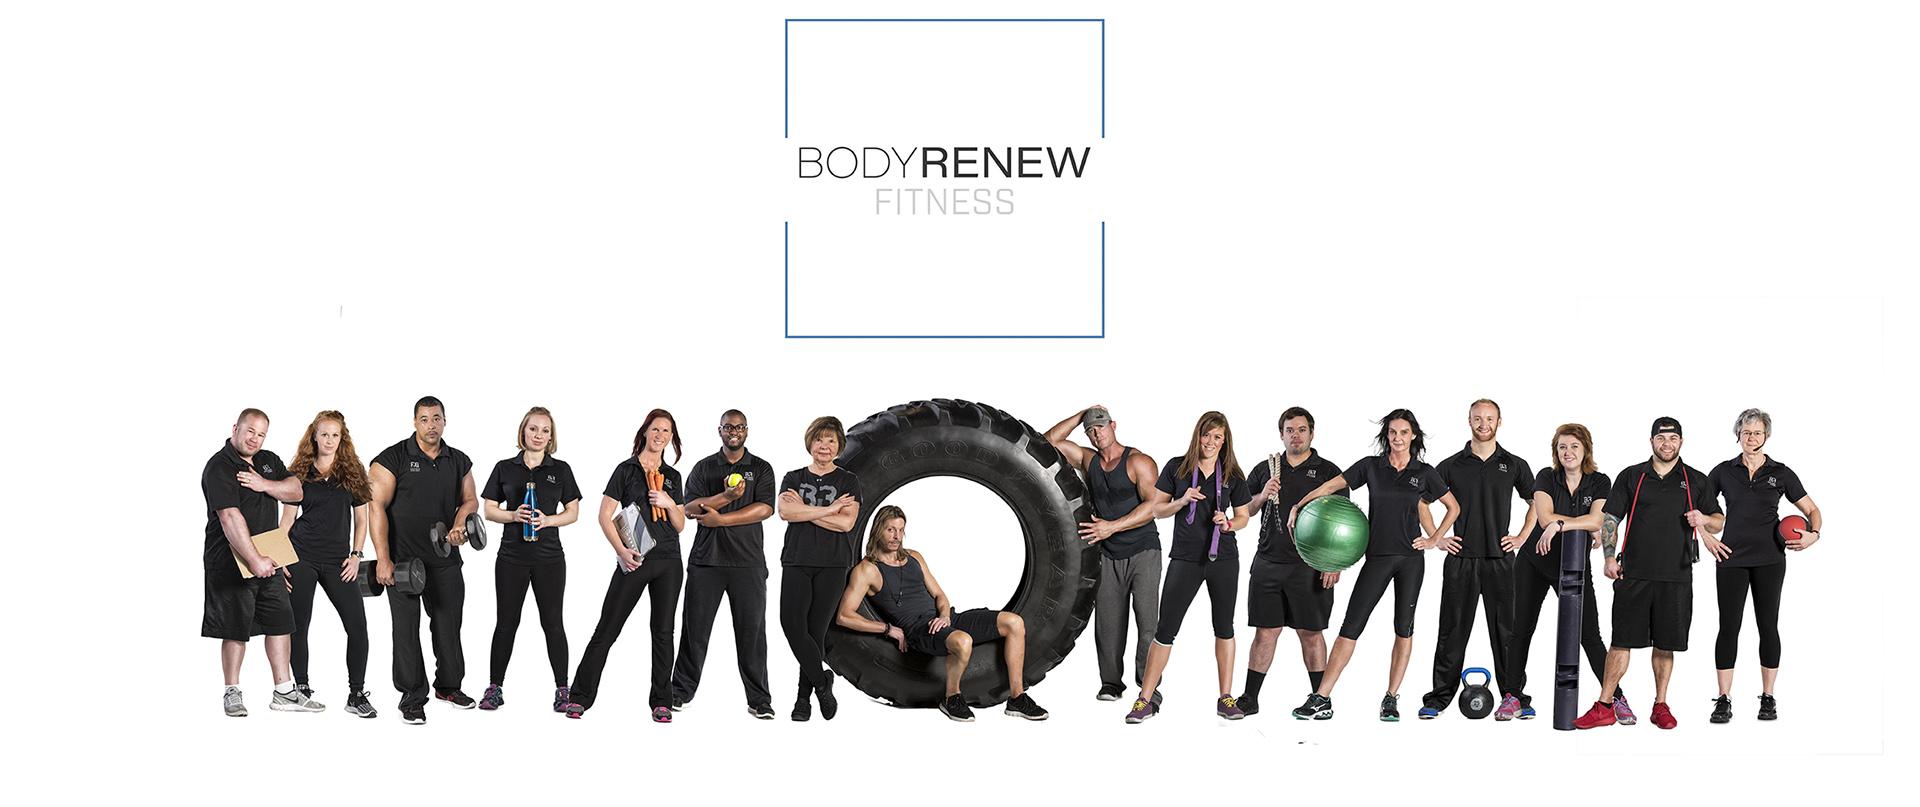 Fitness Team Group Portrait